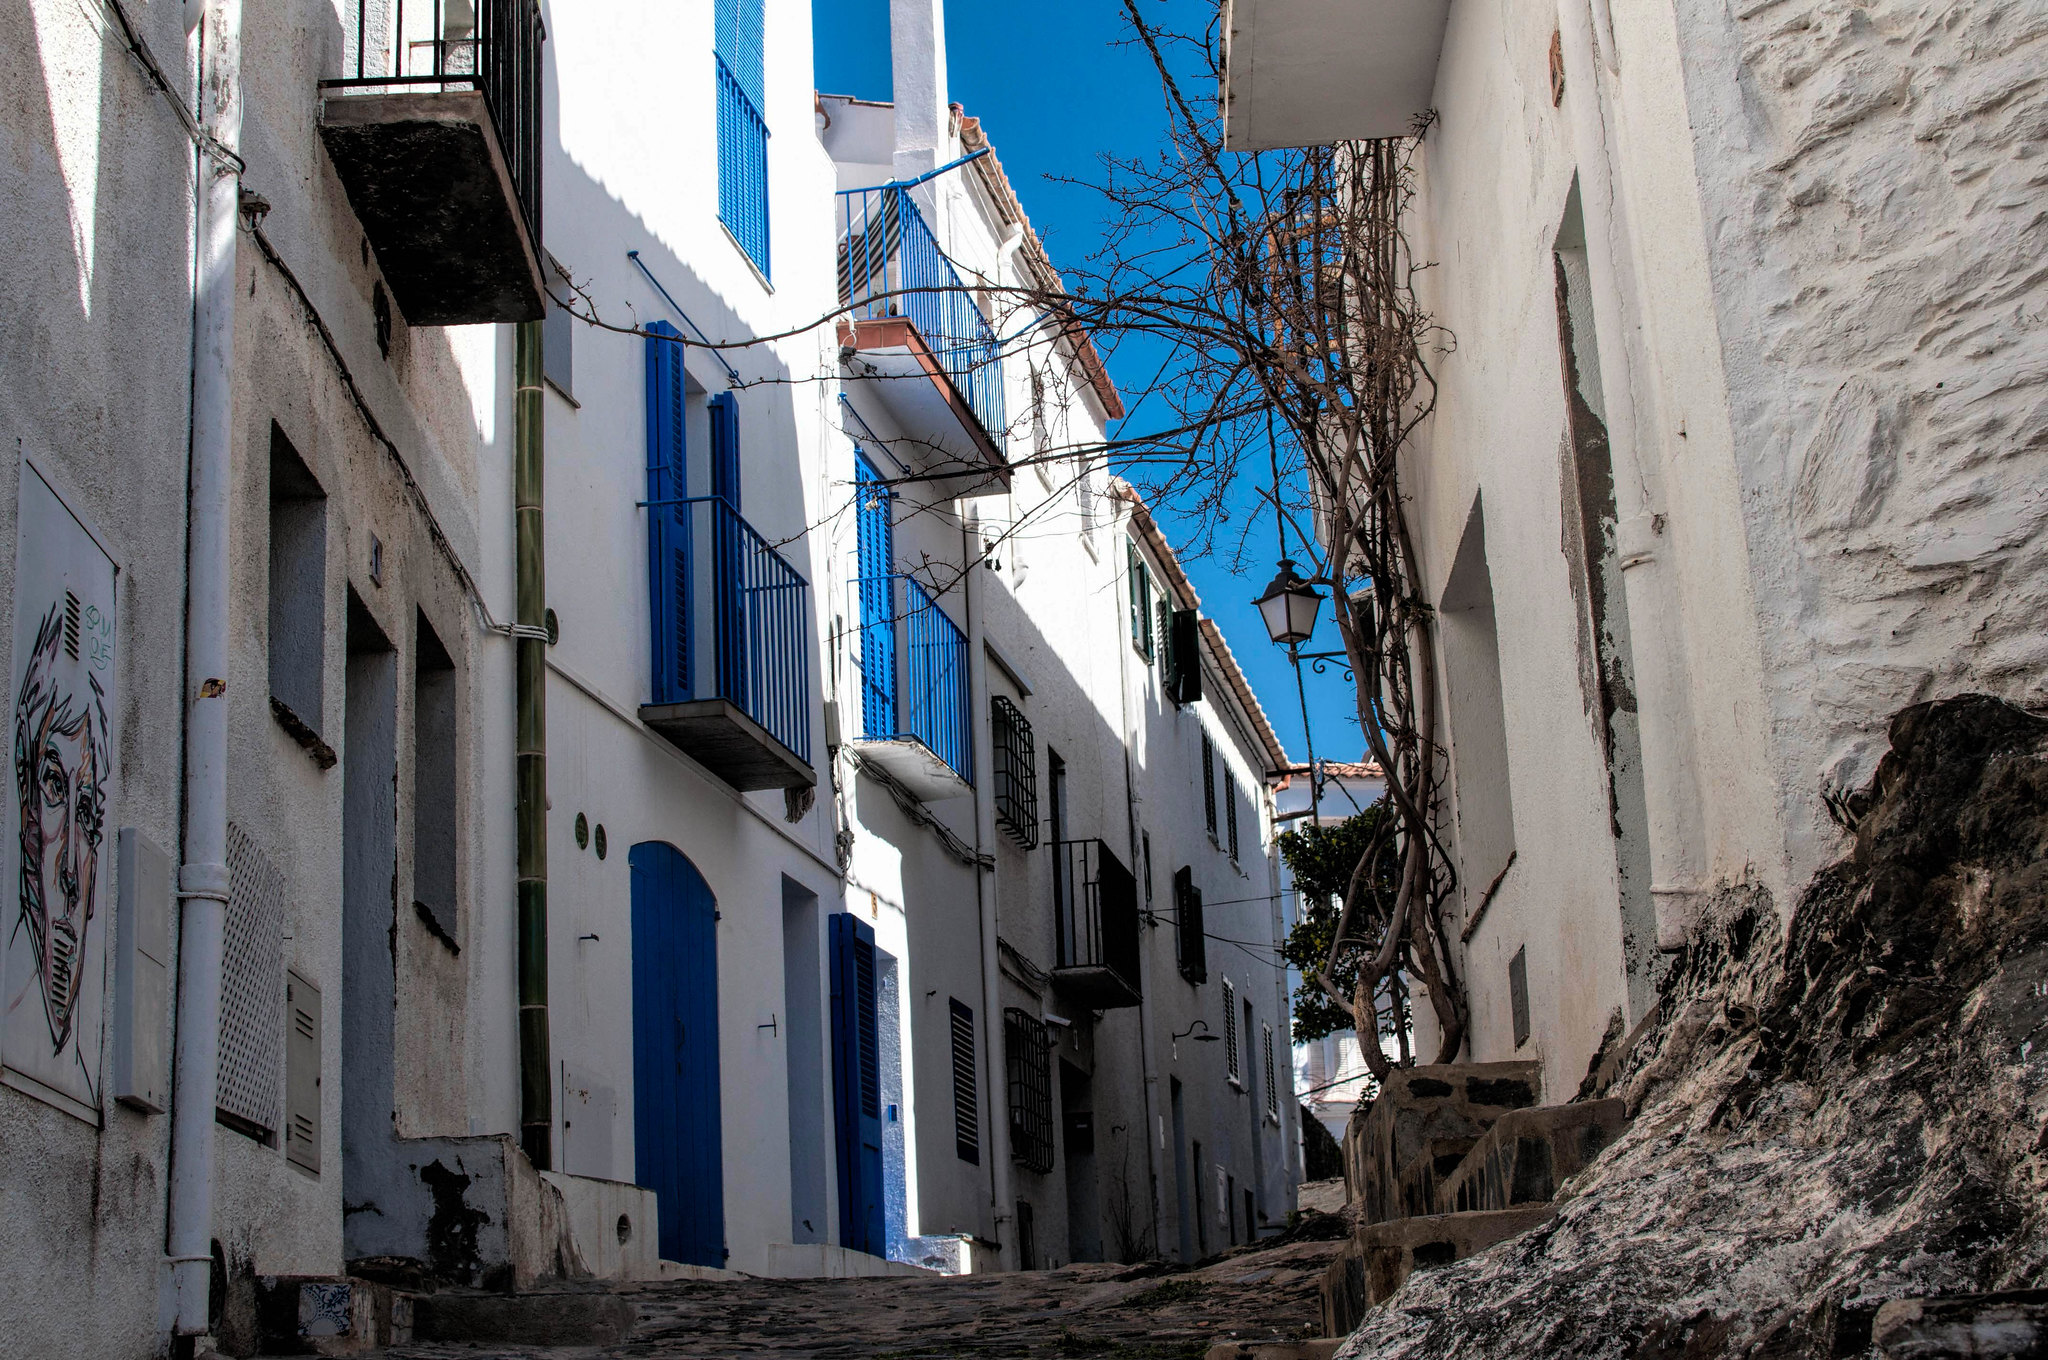 CADAQUÉS. Girona